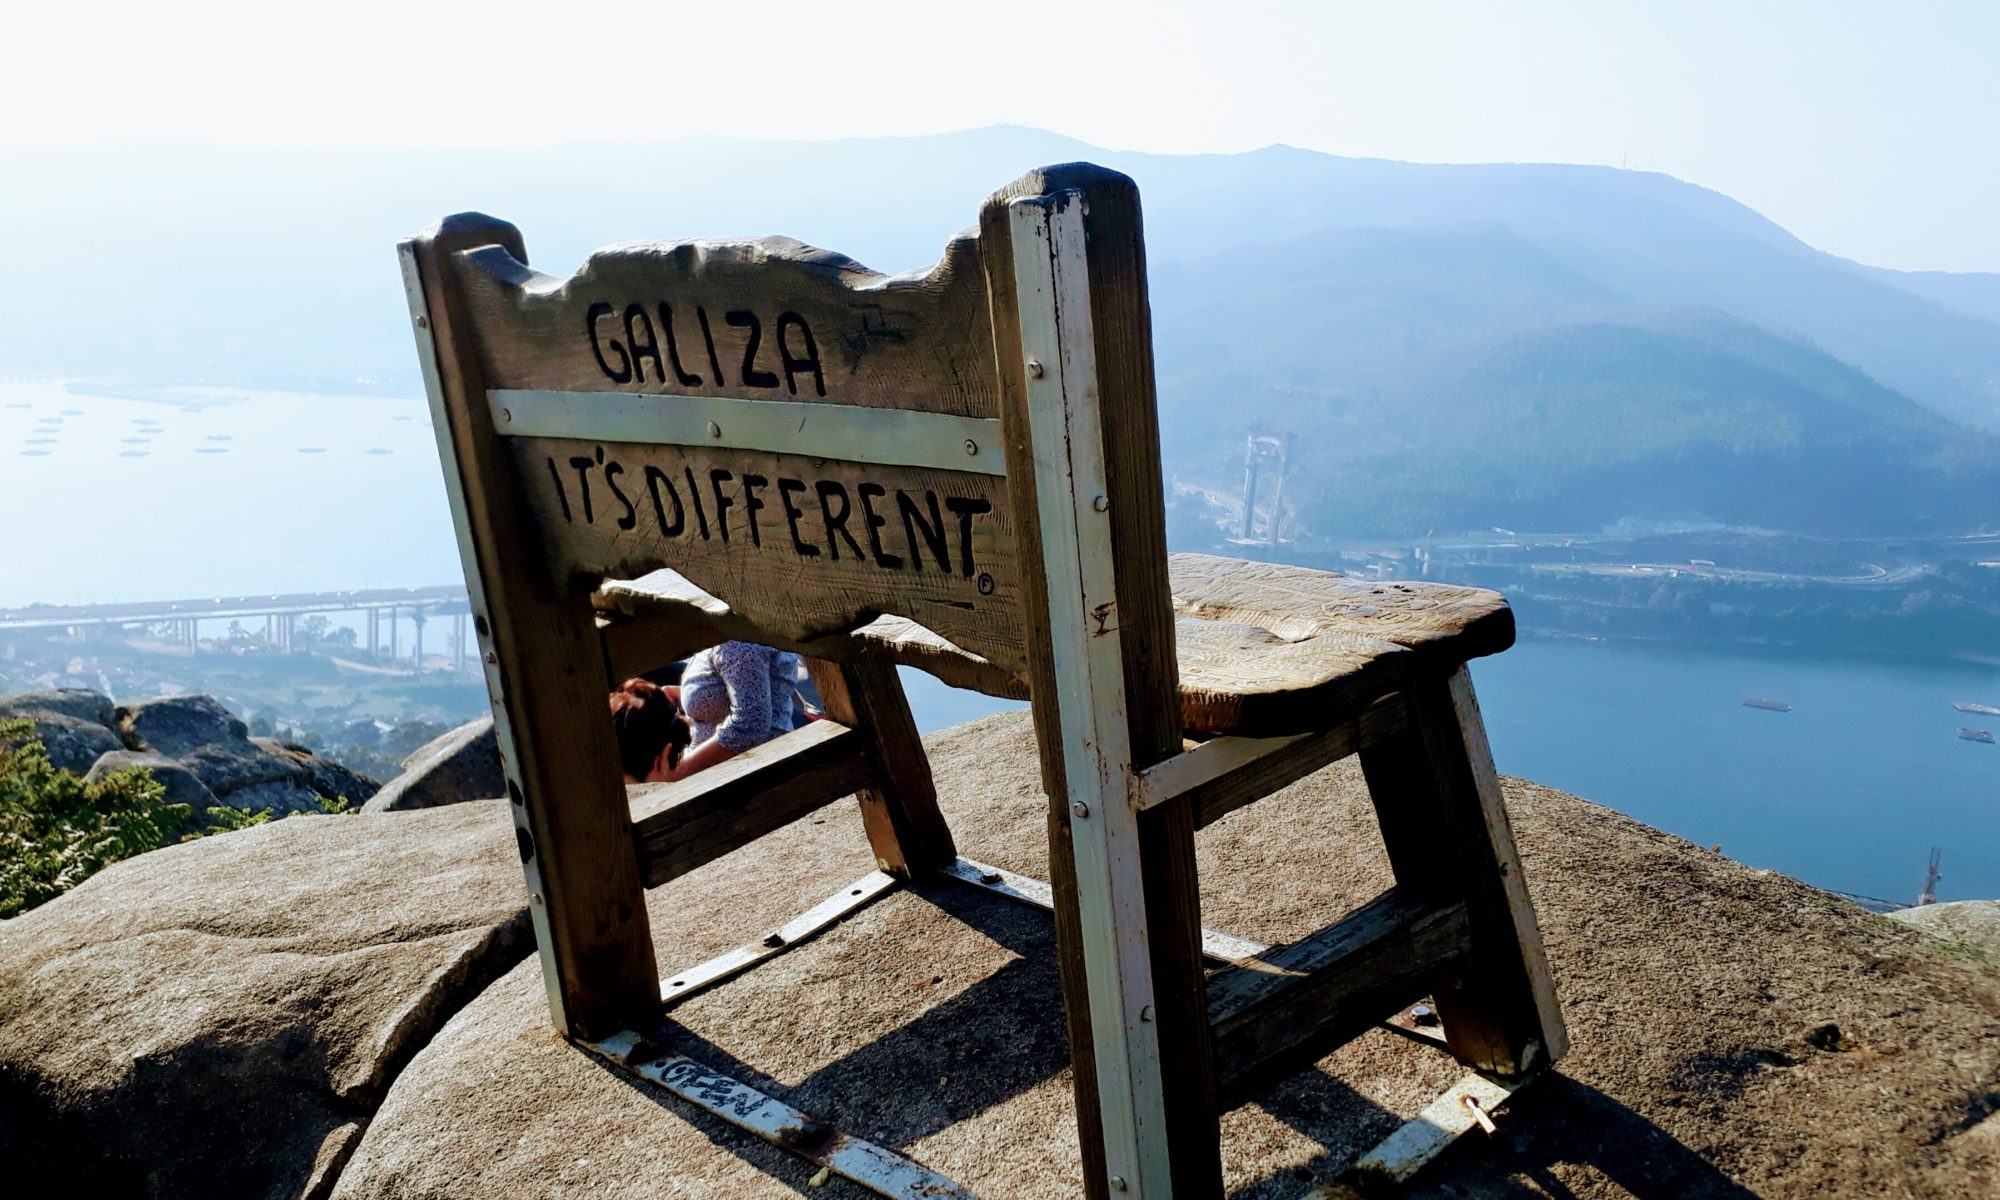 Rías Bajas: Galiza – it's different